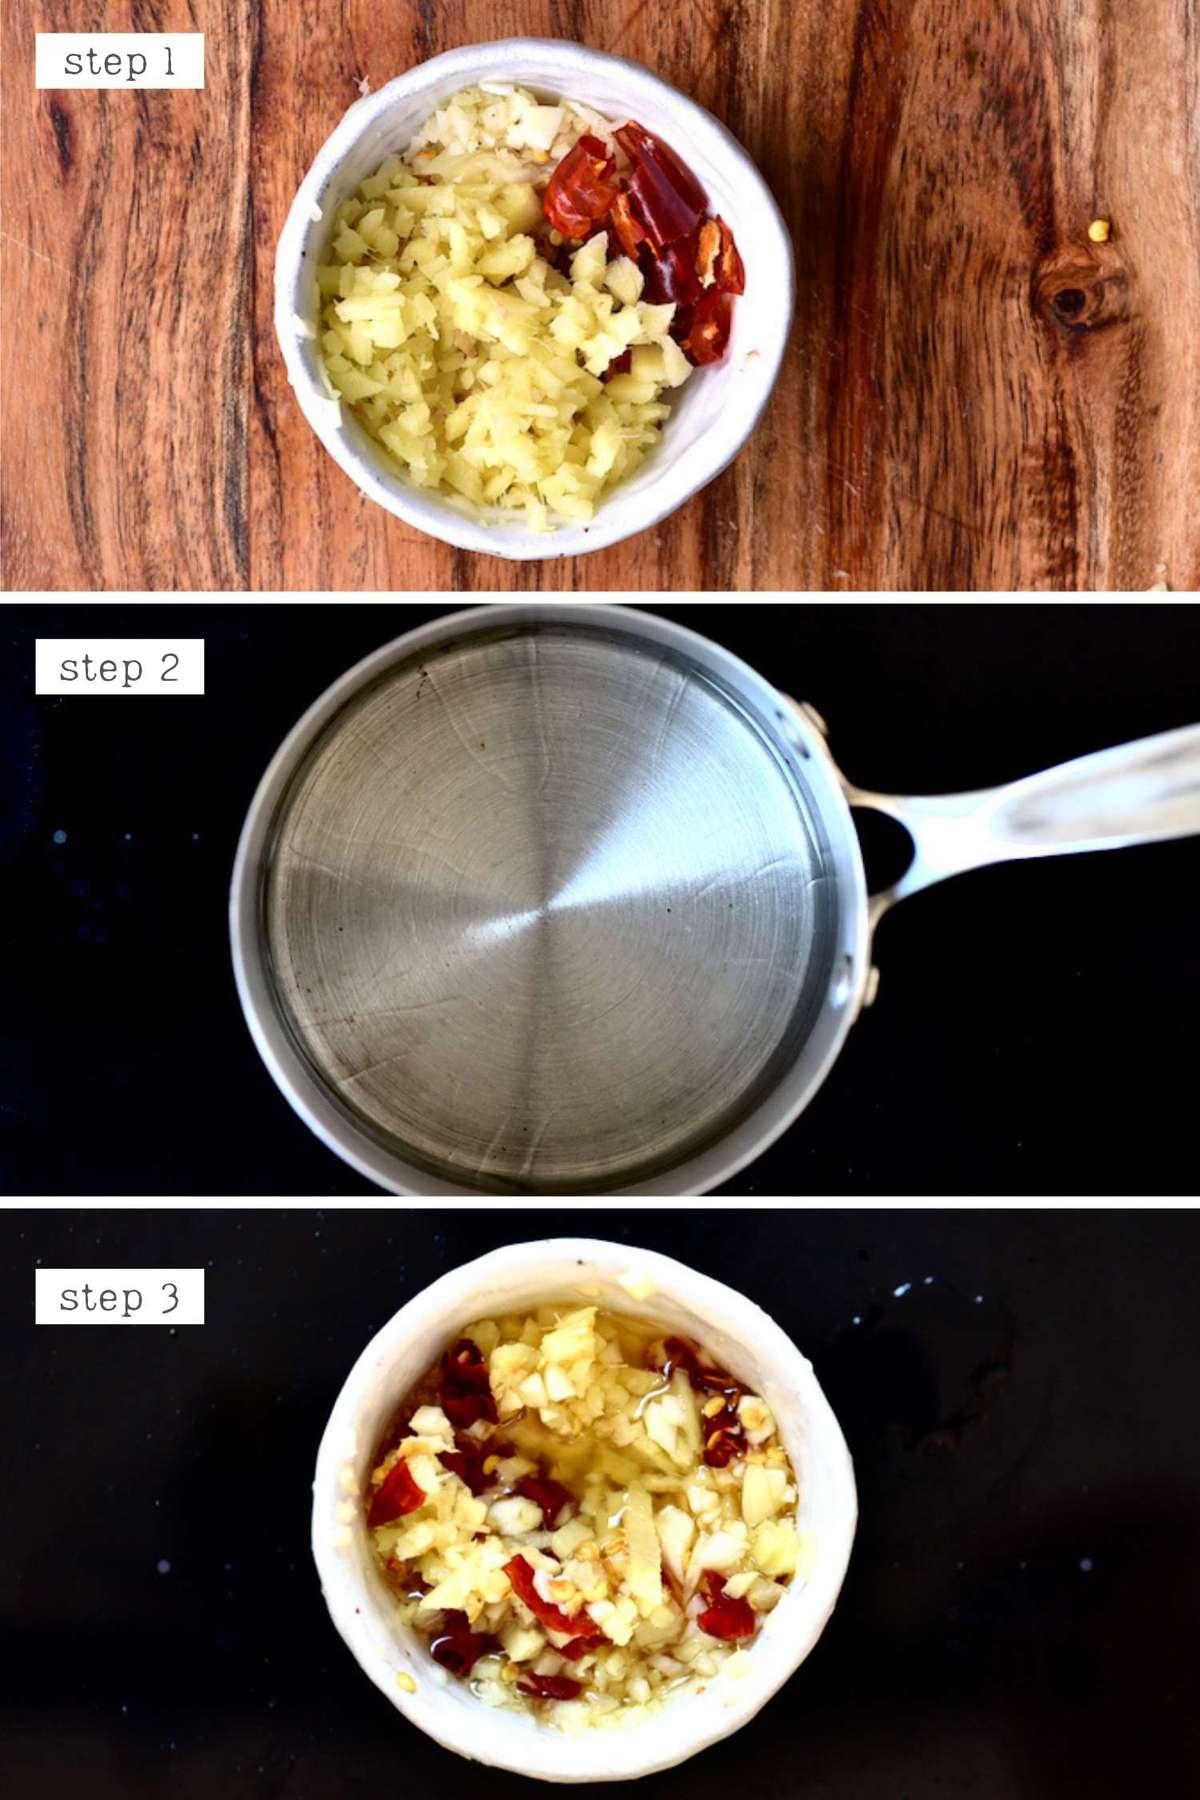 Steps for making garlic ginger infused oil